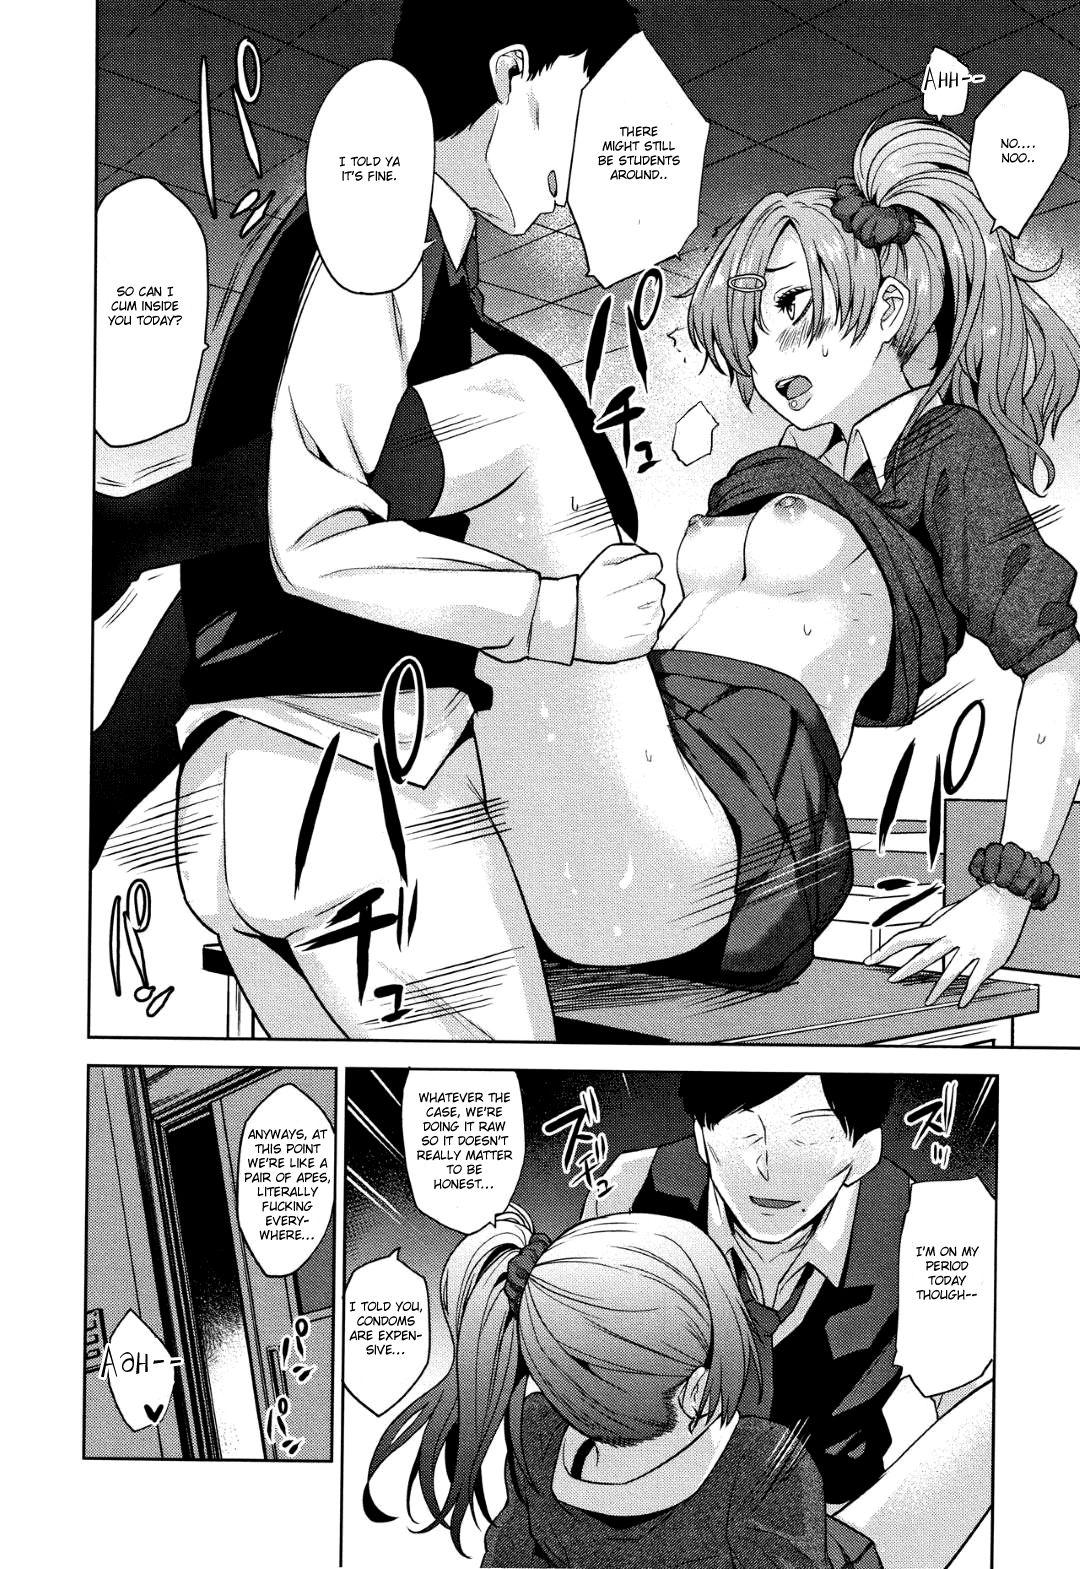 [Azuse] Kawaii Onnanoko o Tsuru Houhou - Method to catch a pretty girl Ch. 1-5 [English] [GMDTranslations] 71